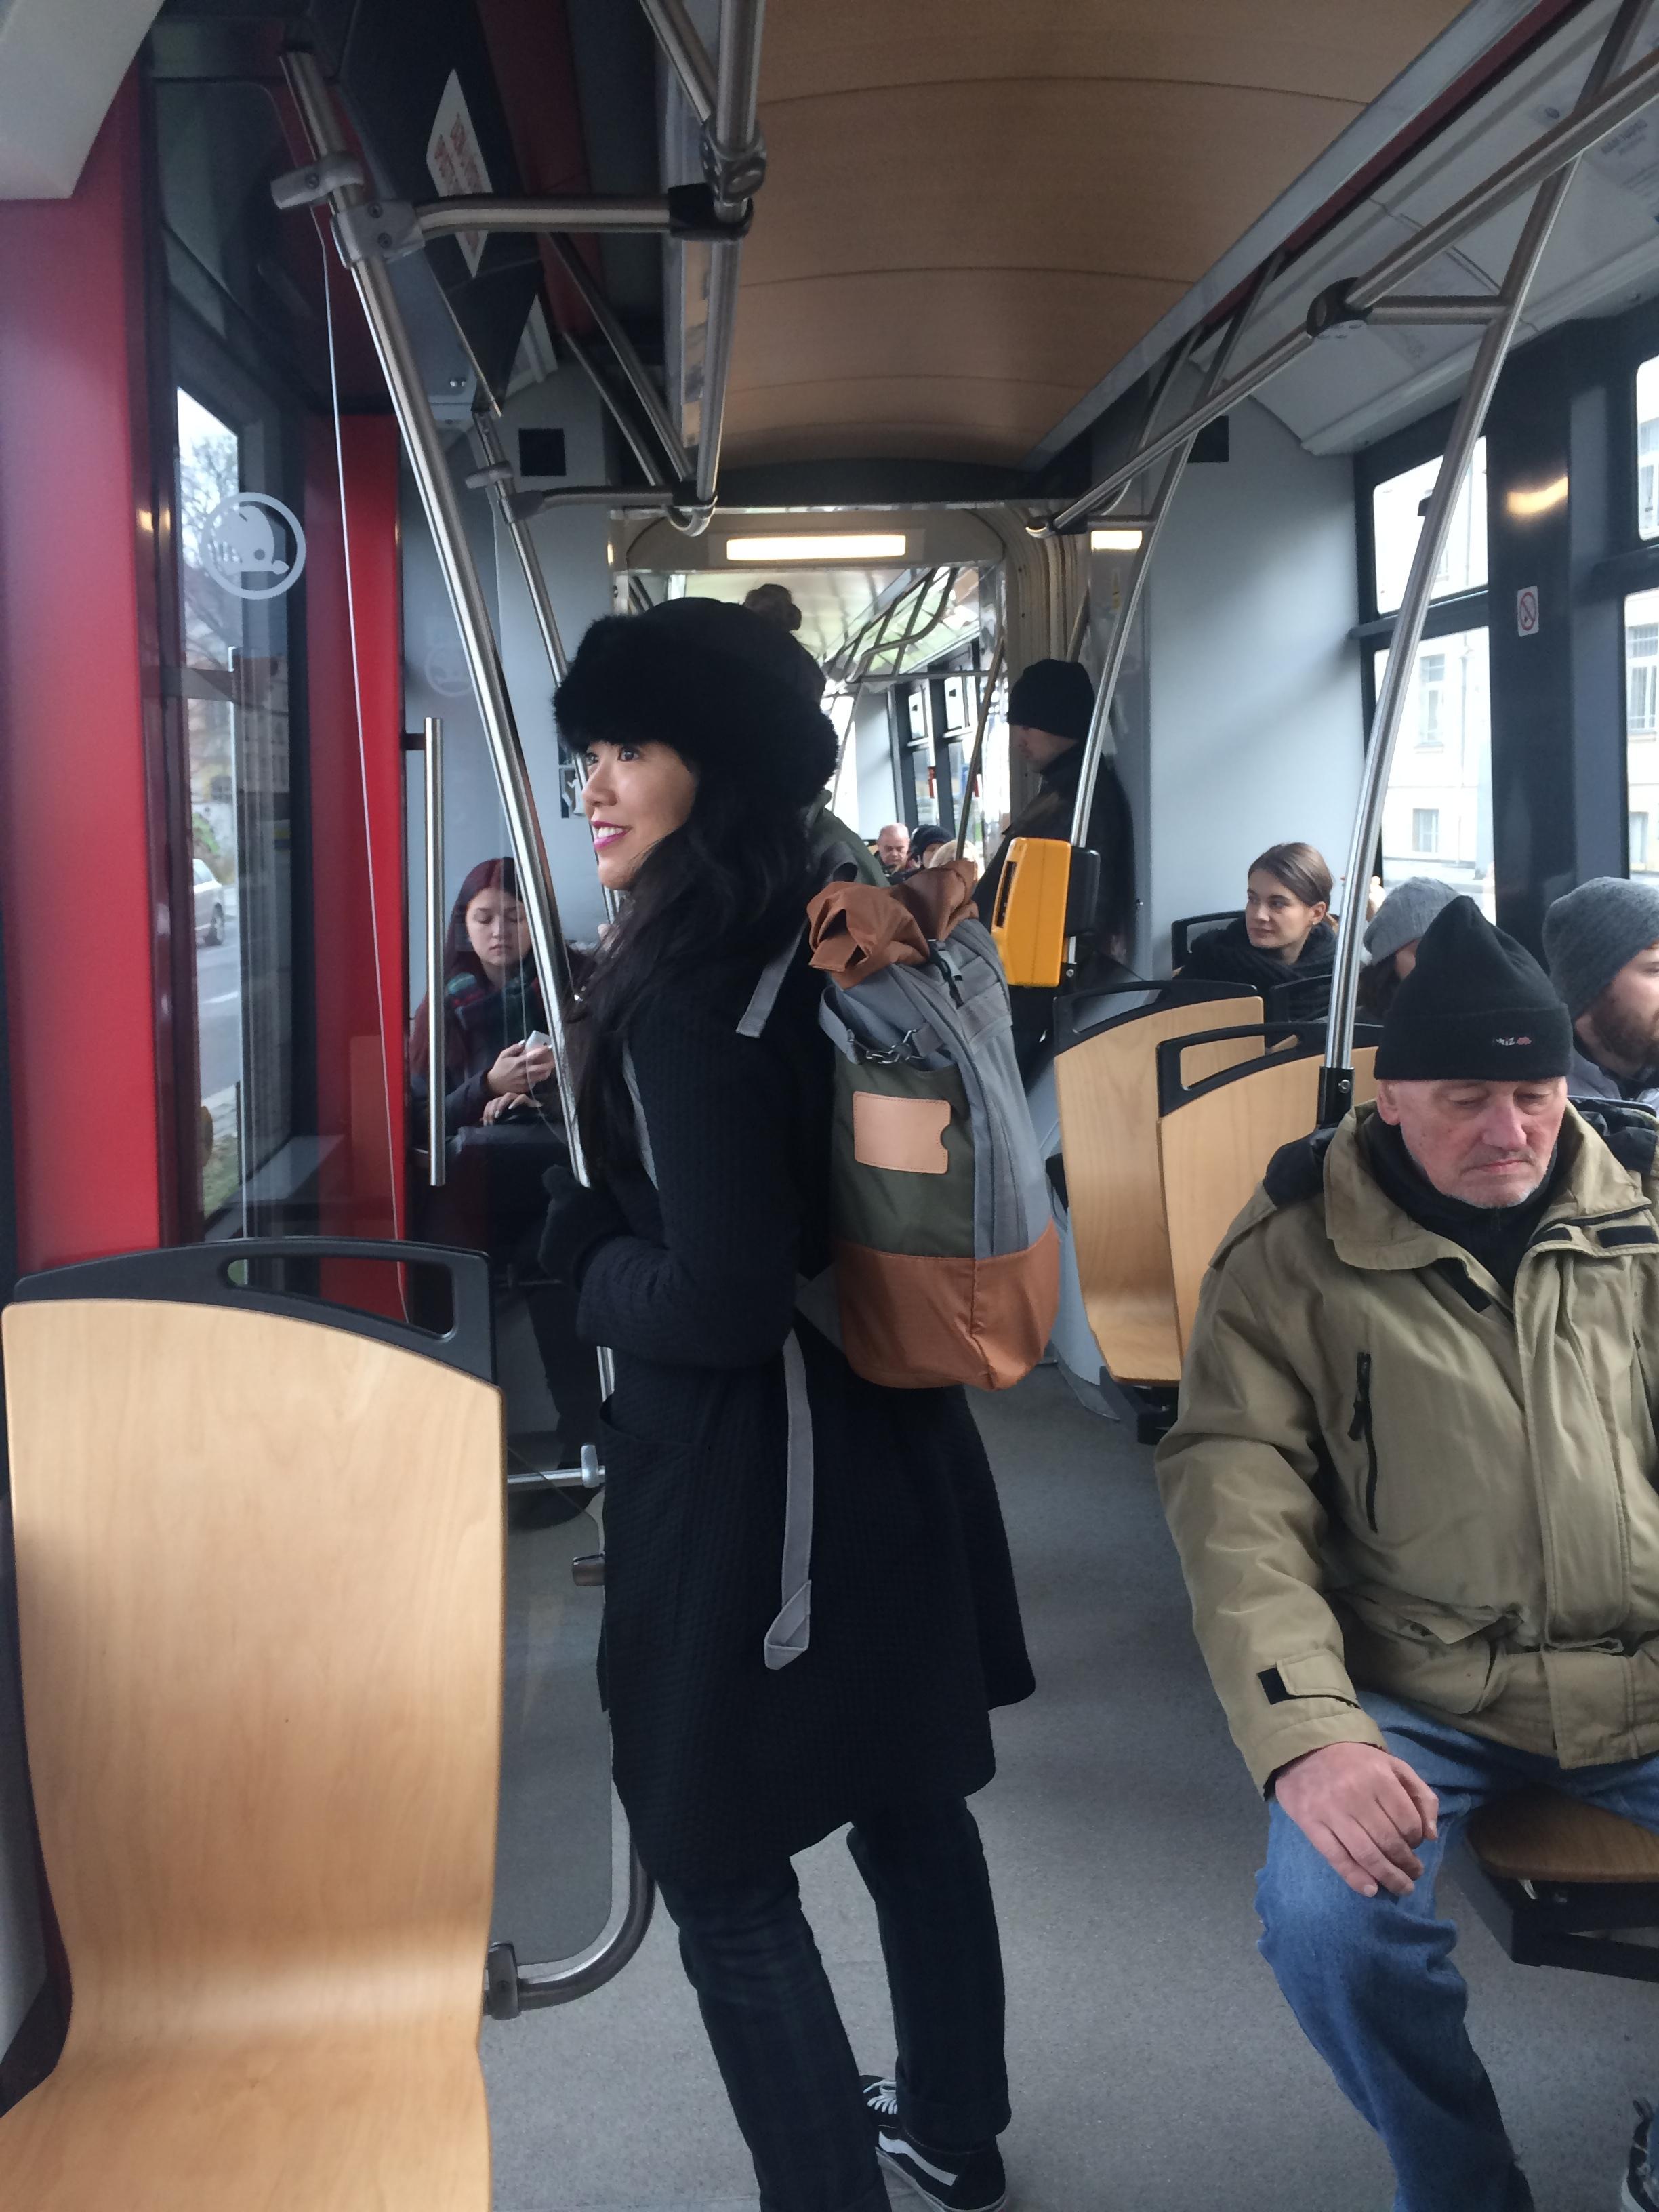 Warm, Clean Trams